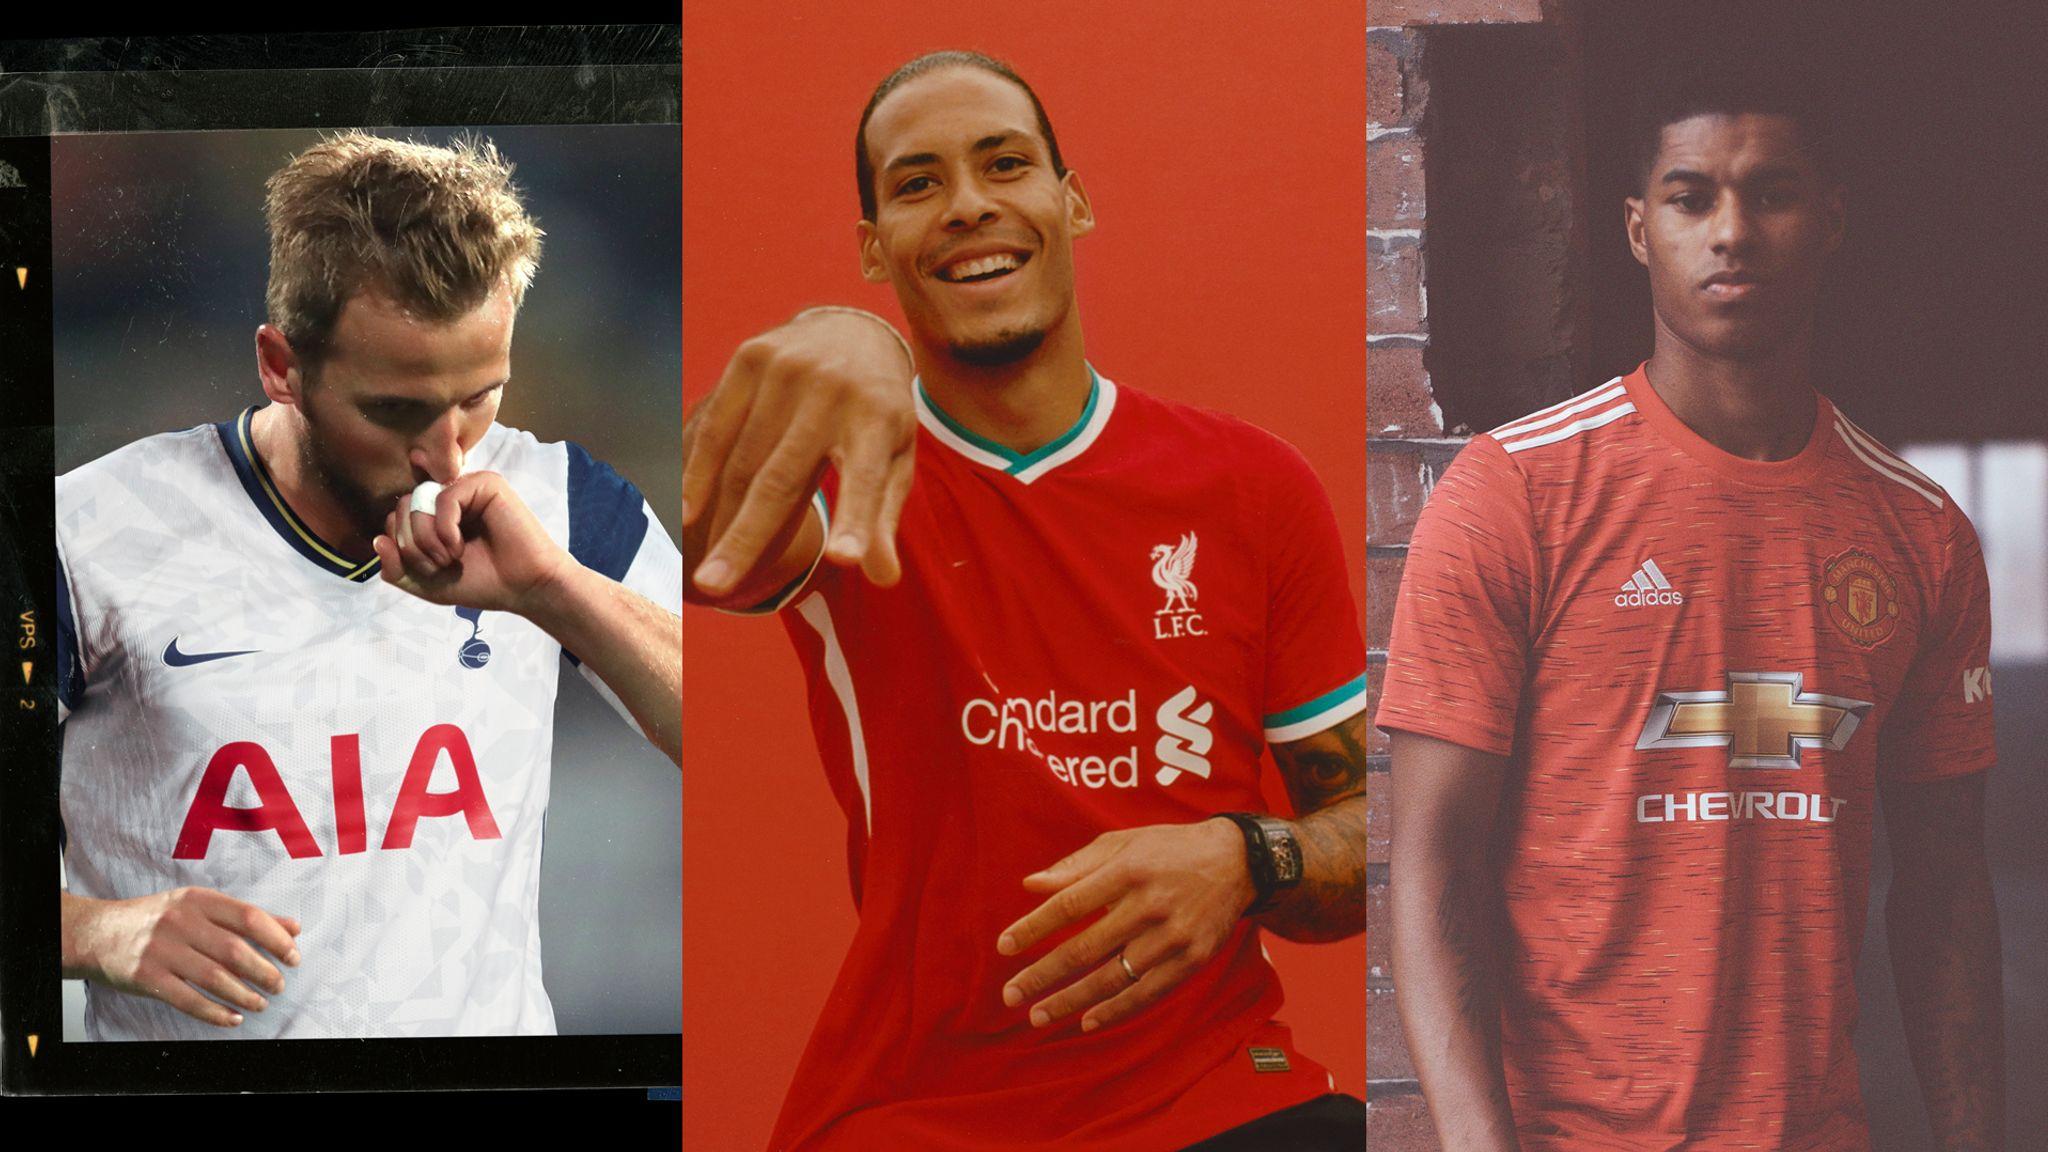 Premier League Kits New Strips For 2020 21 Football News Sky Sports